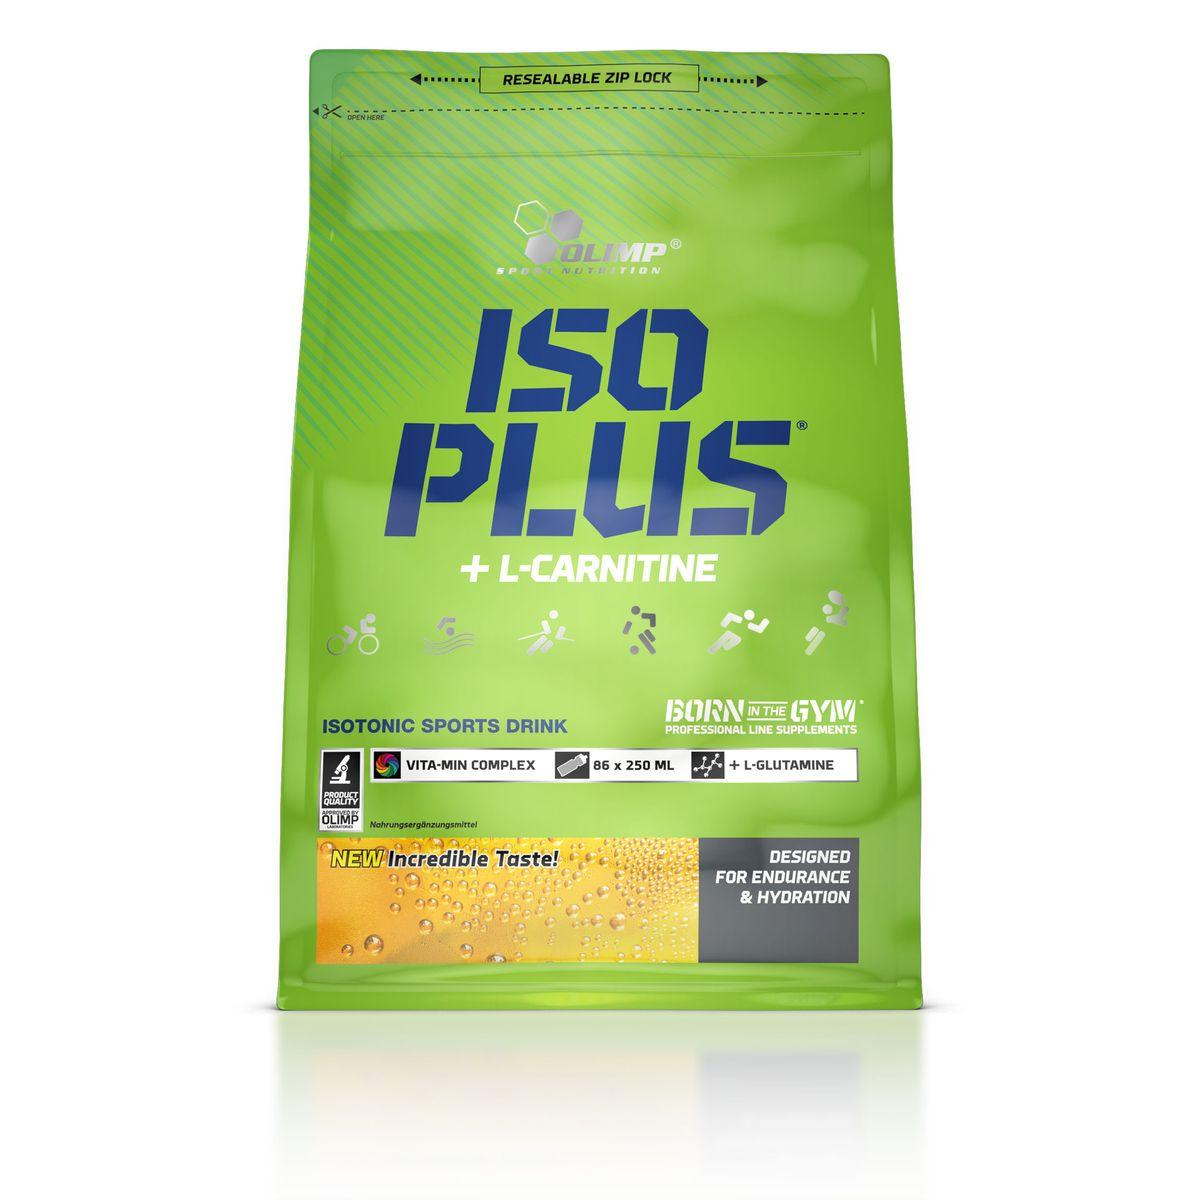 OLIMP Изотонический напиток Iso Plus Powder 1505г, апельсин ( O28816 )